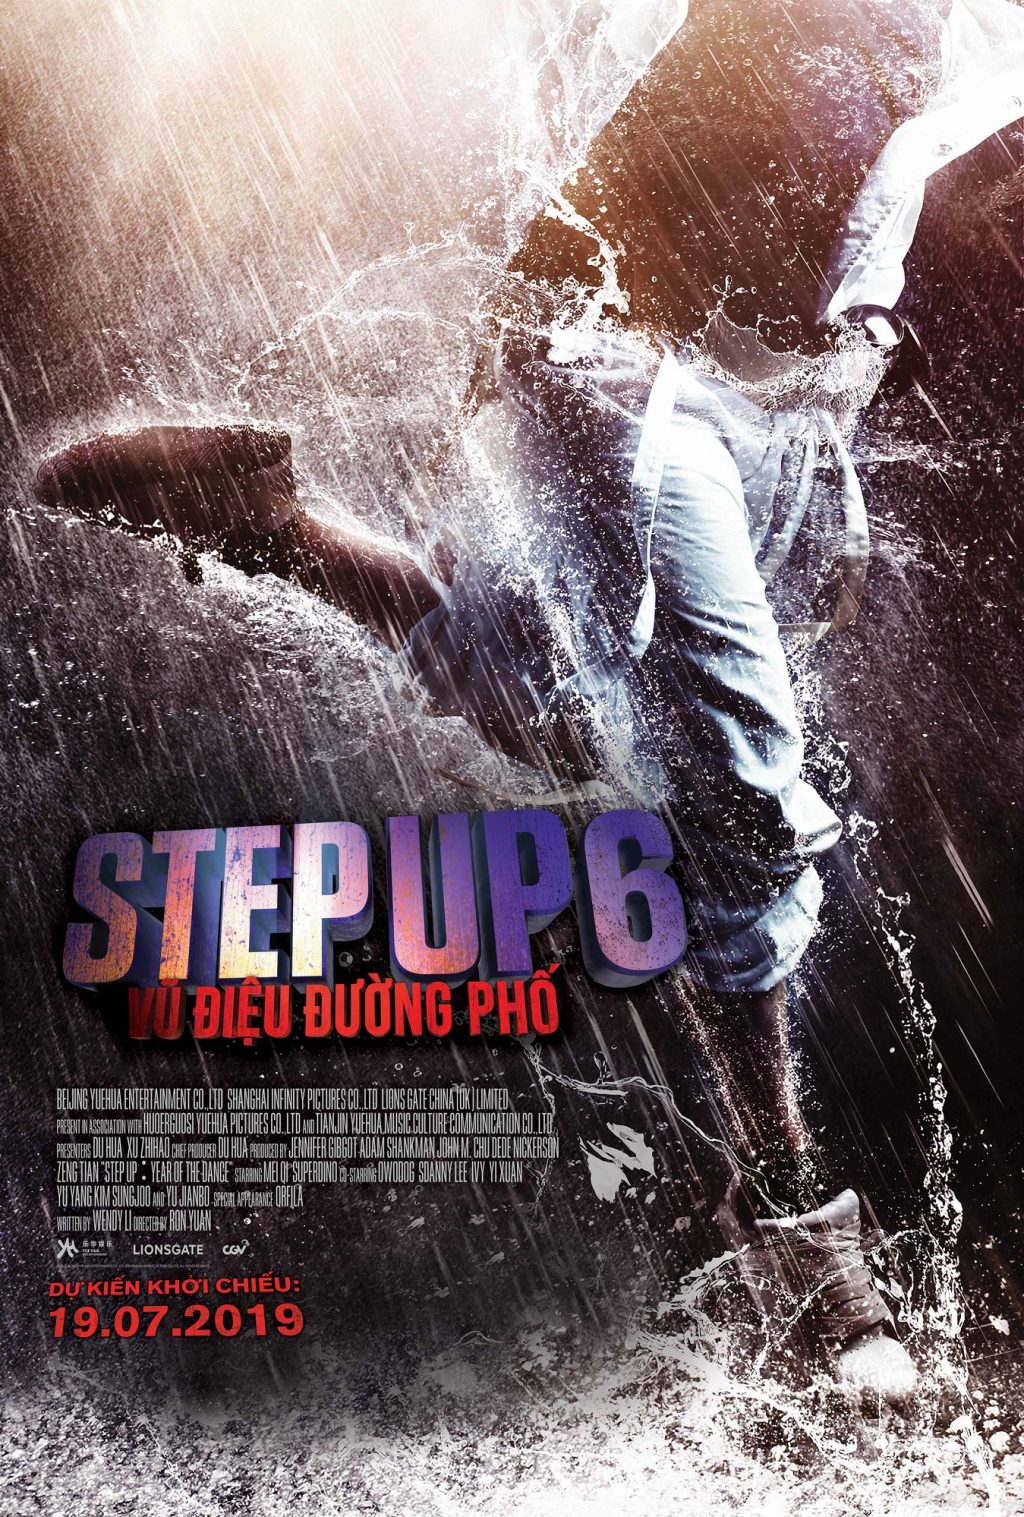 phim chiếu rạp step up